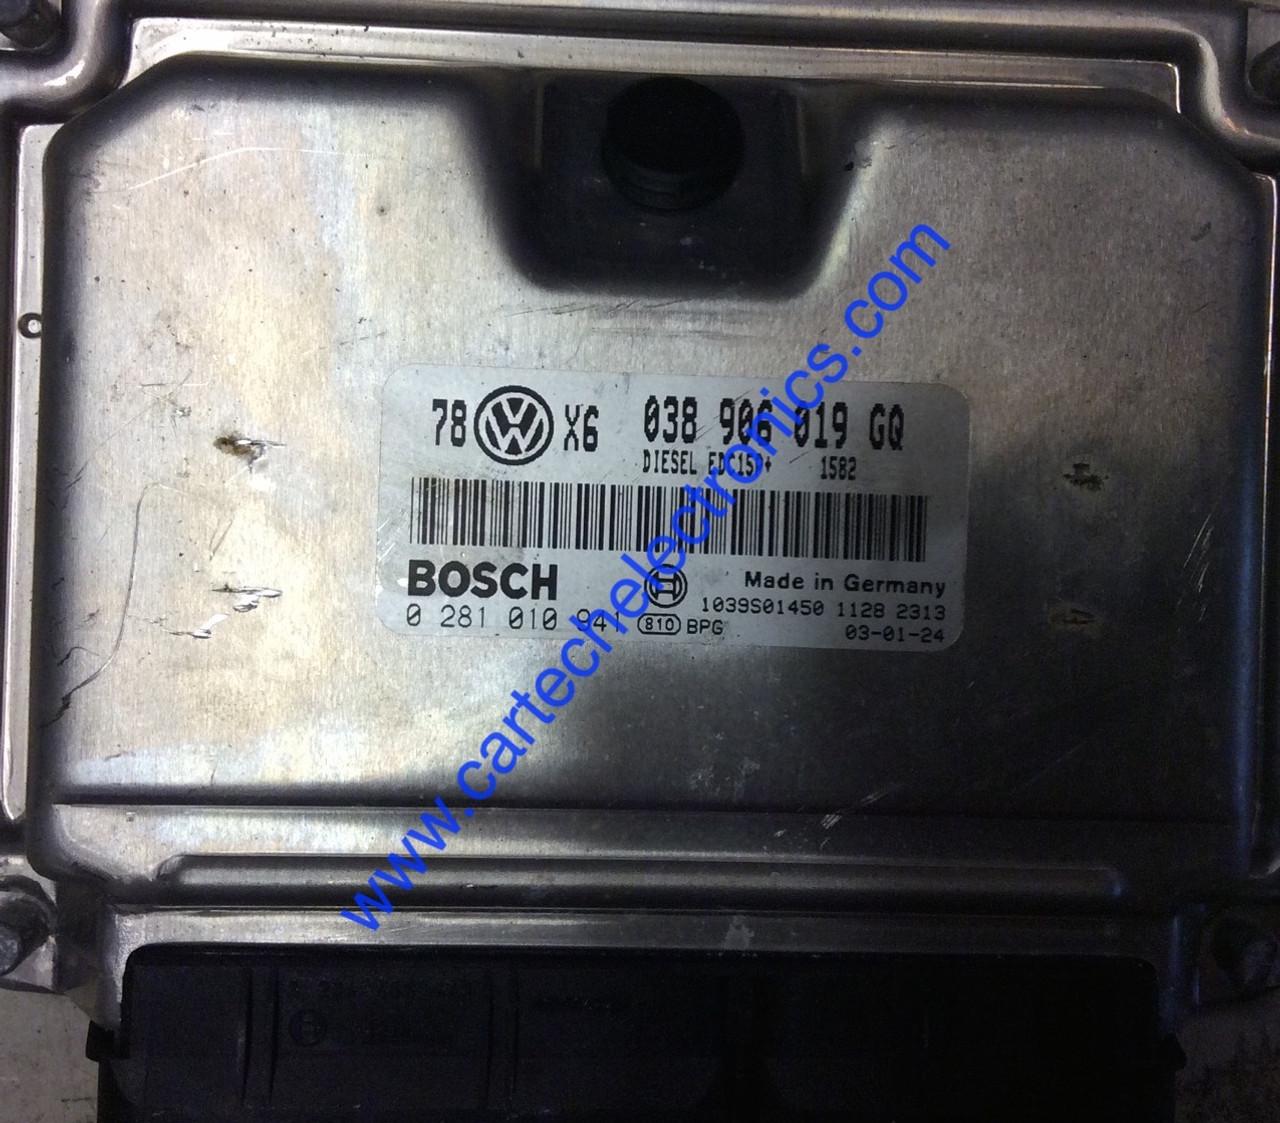 VW Passat 1.9 TDI, 0281010941, 0281 010 941, 038906019GQ, 038 906 019 GQ, EDC15P+